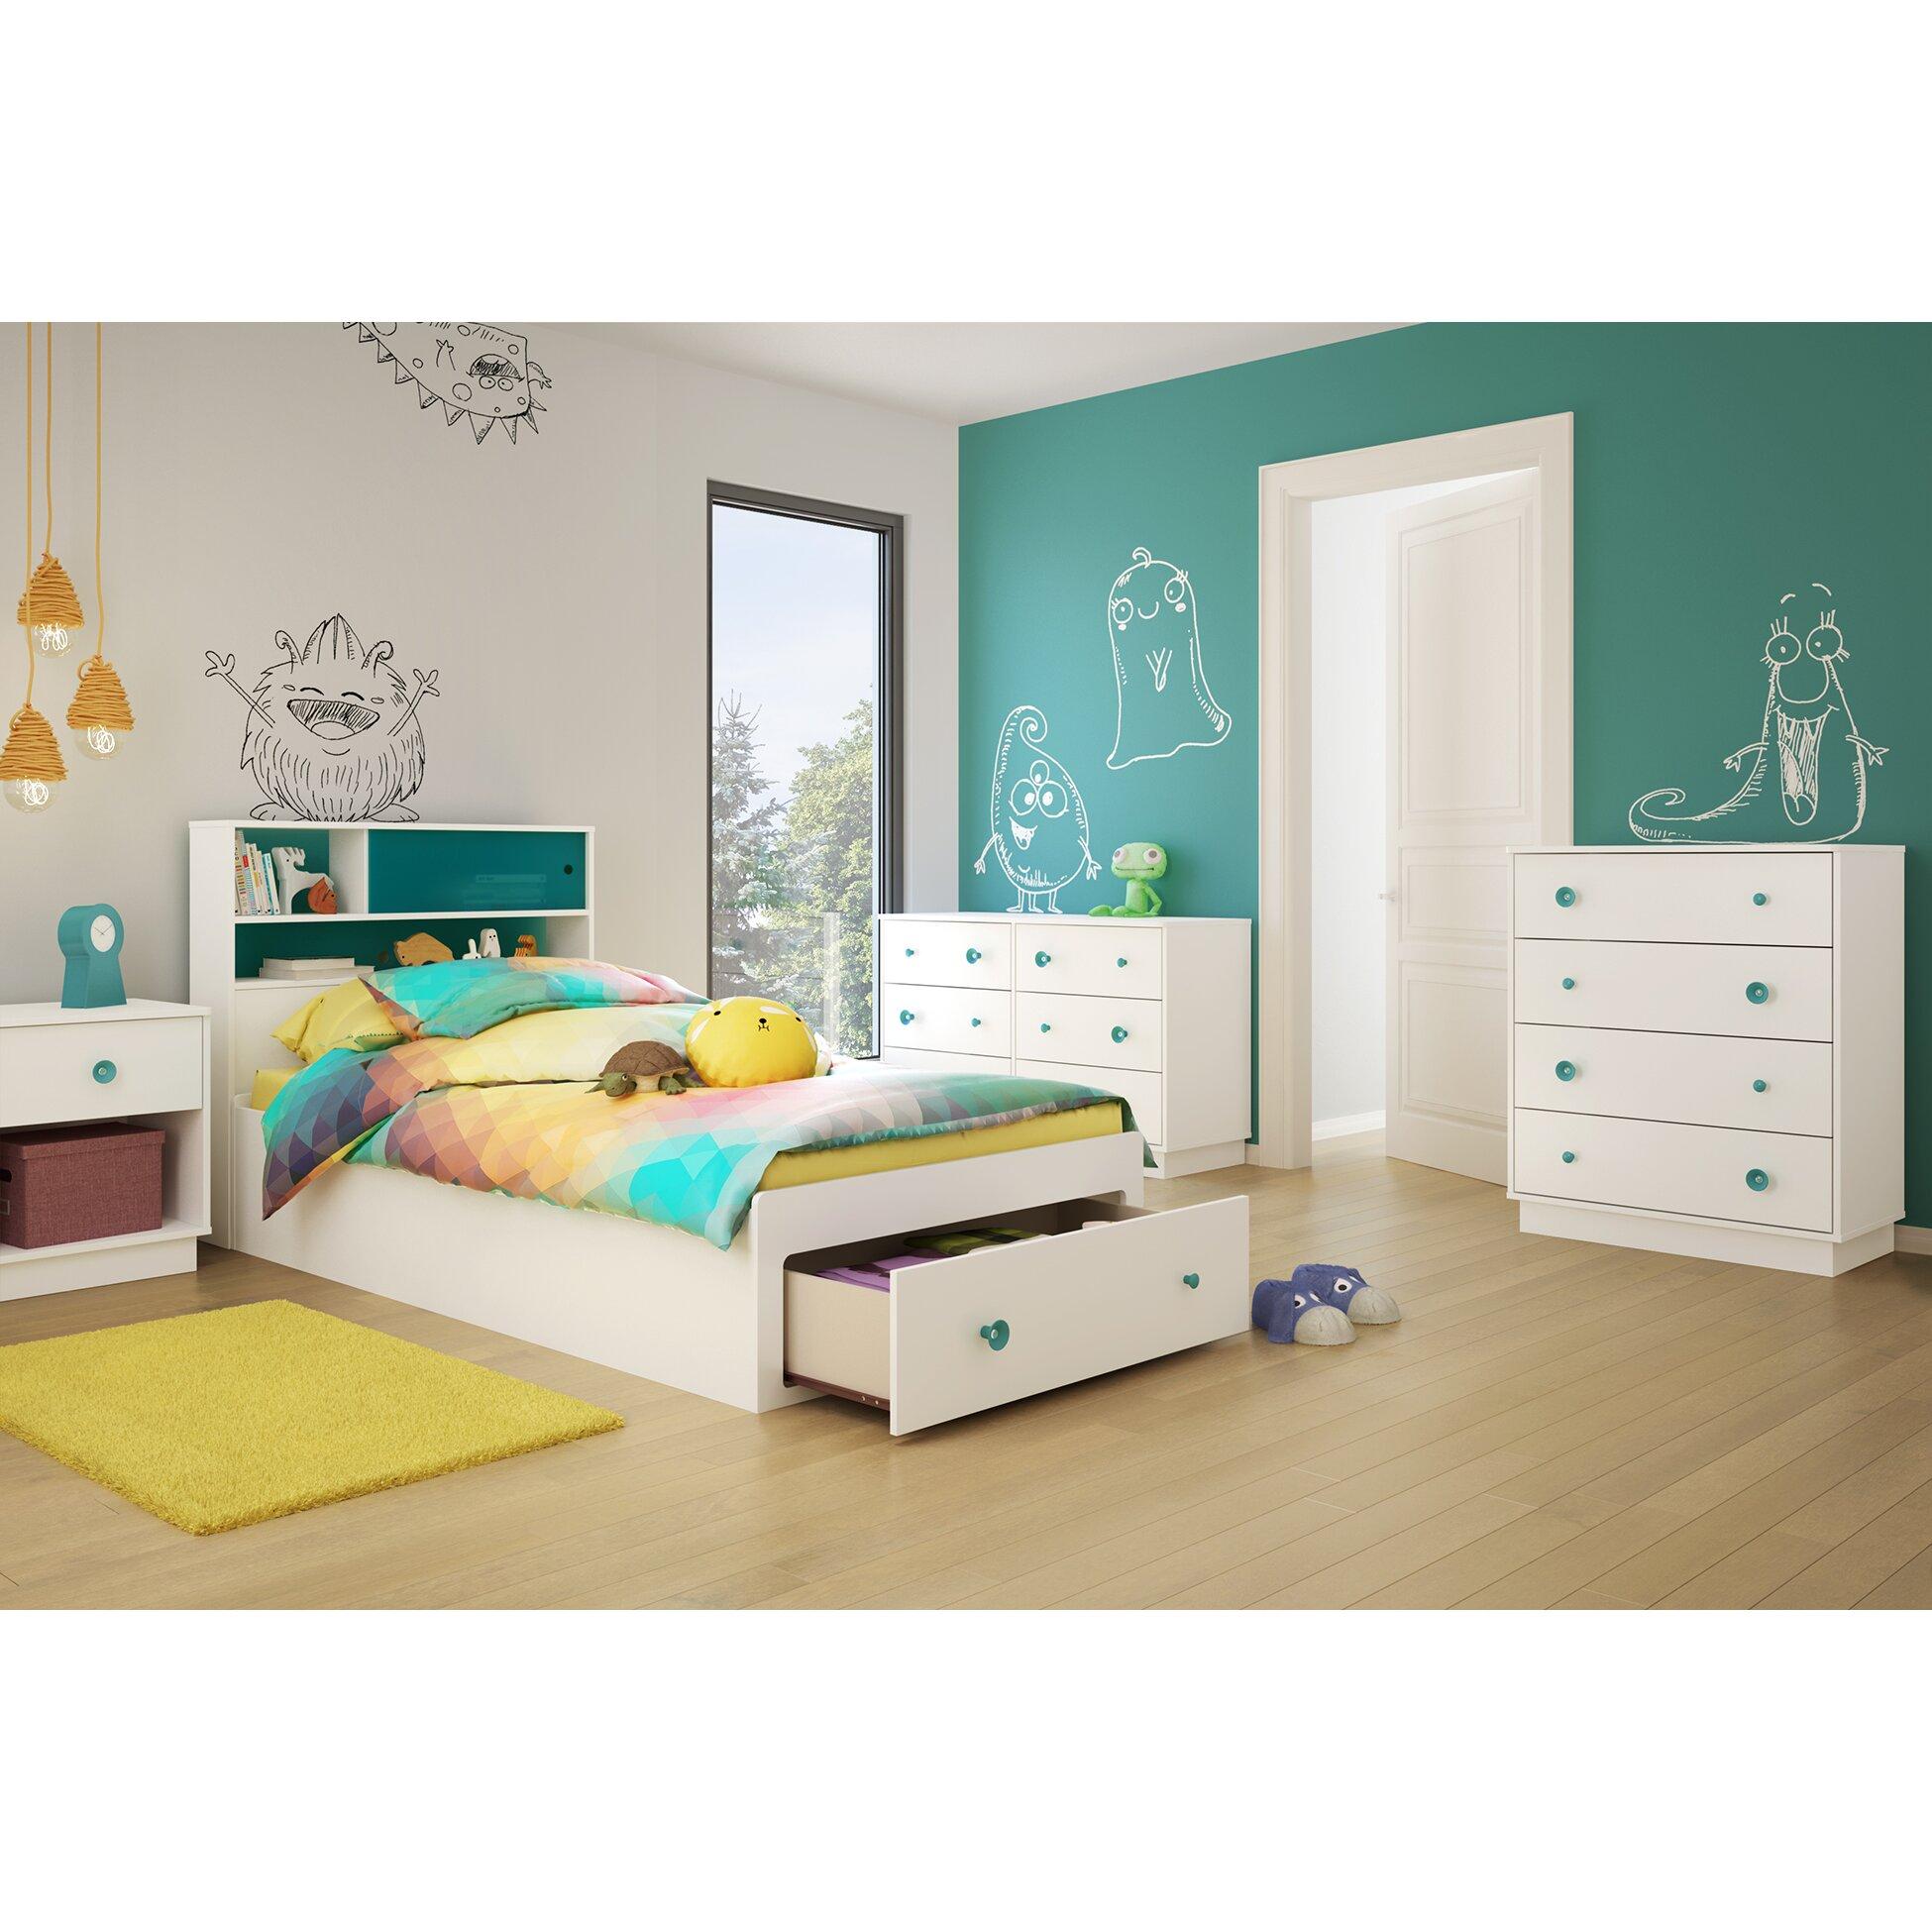 Kids Bedroom SetJeremyScottAngelcom